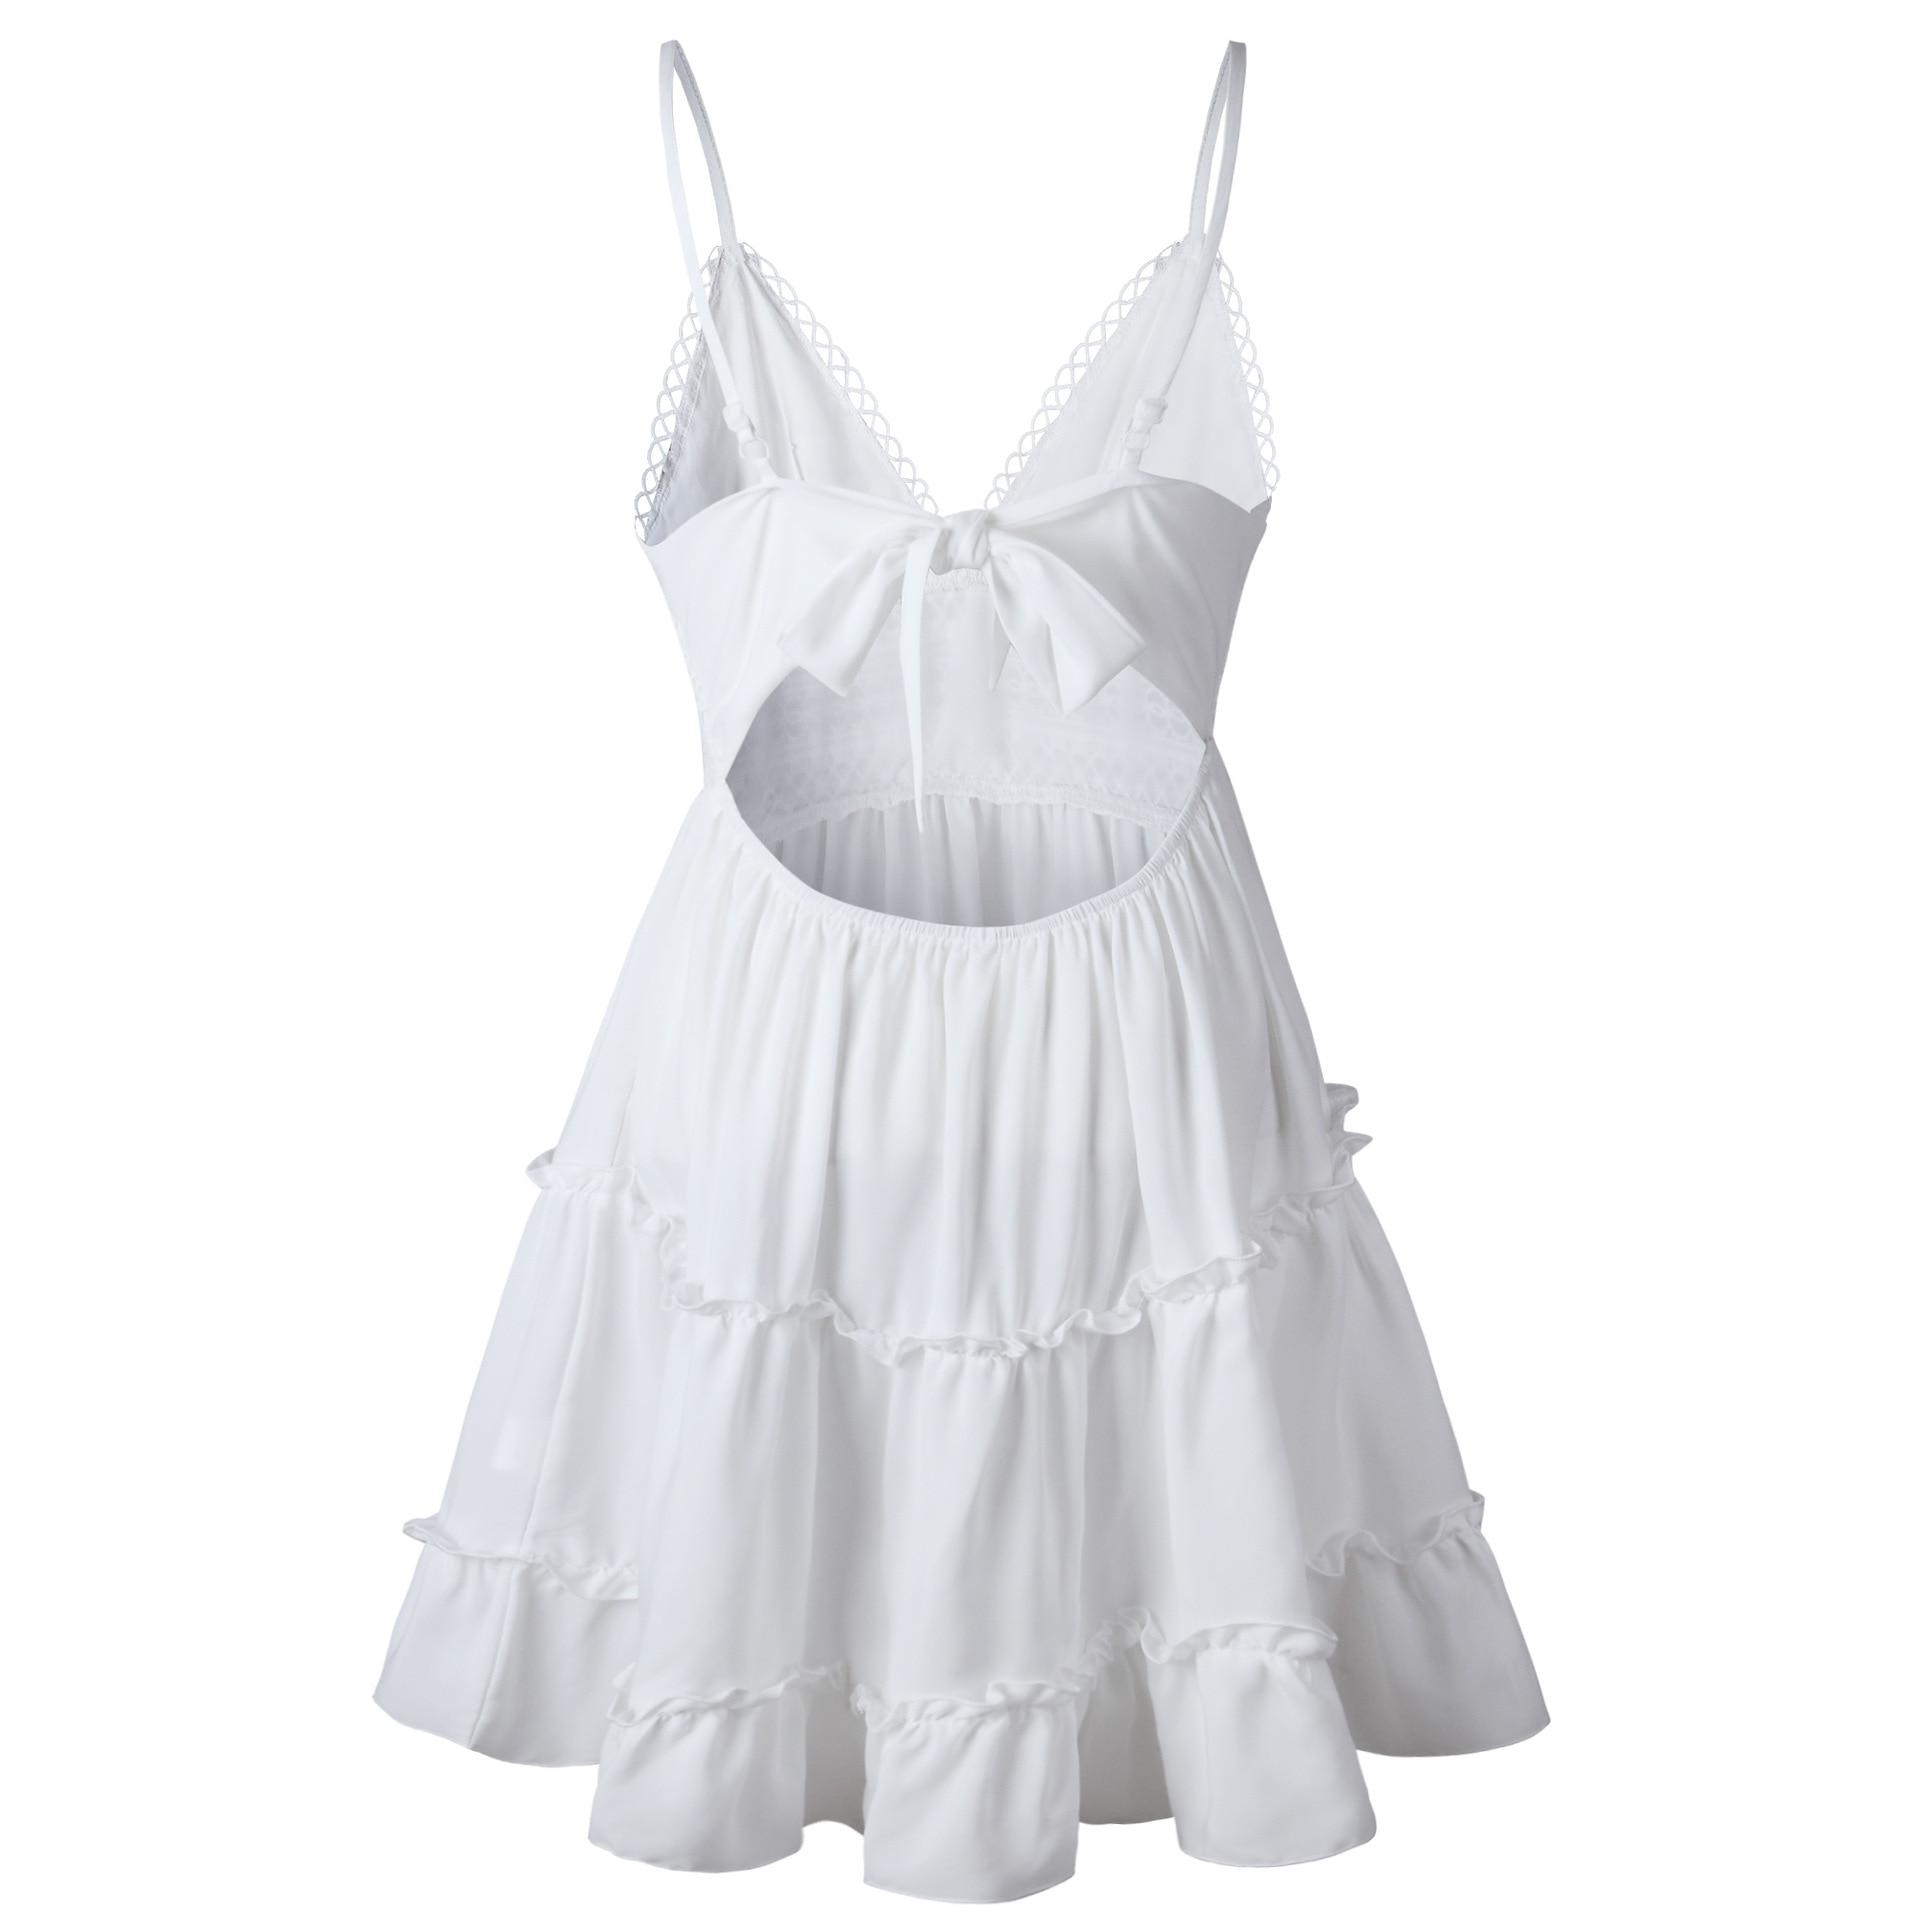 Summer Women White Lace Halter Dress Sexy Backless Beach Dresses 2020 Fashion Sleeveless Spaghetti Strap Casual Mini Sundress 2